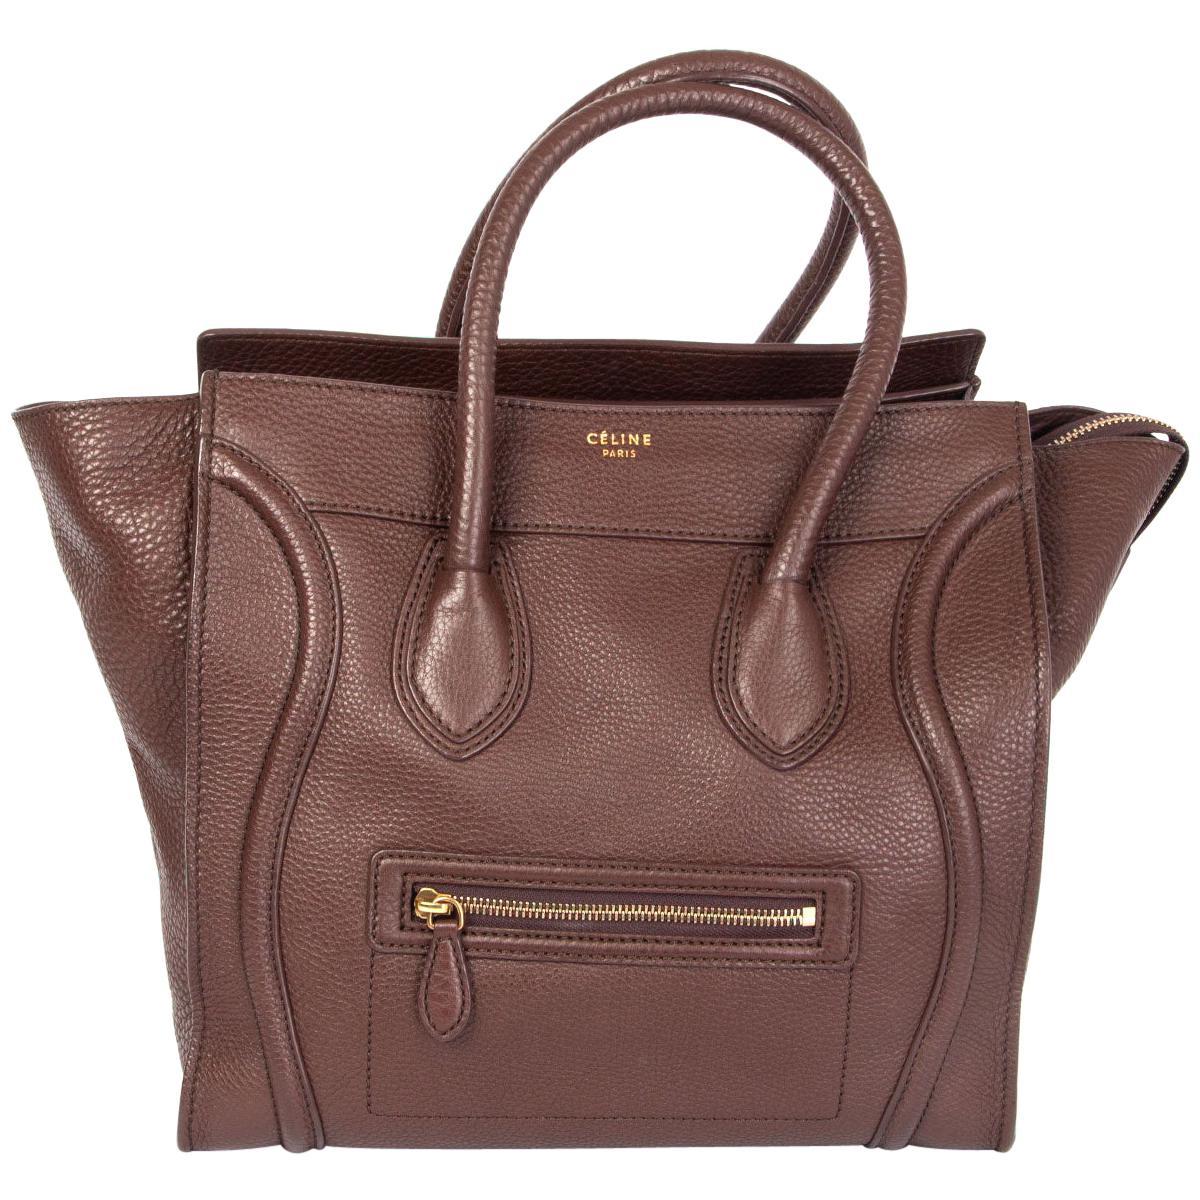 CELINE chocolate brown leather MINI LUGGAGE TOTE Bag